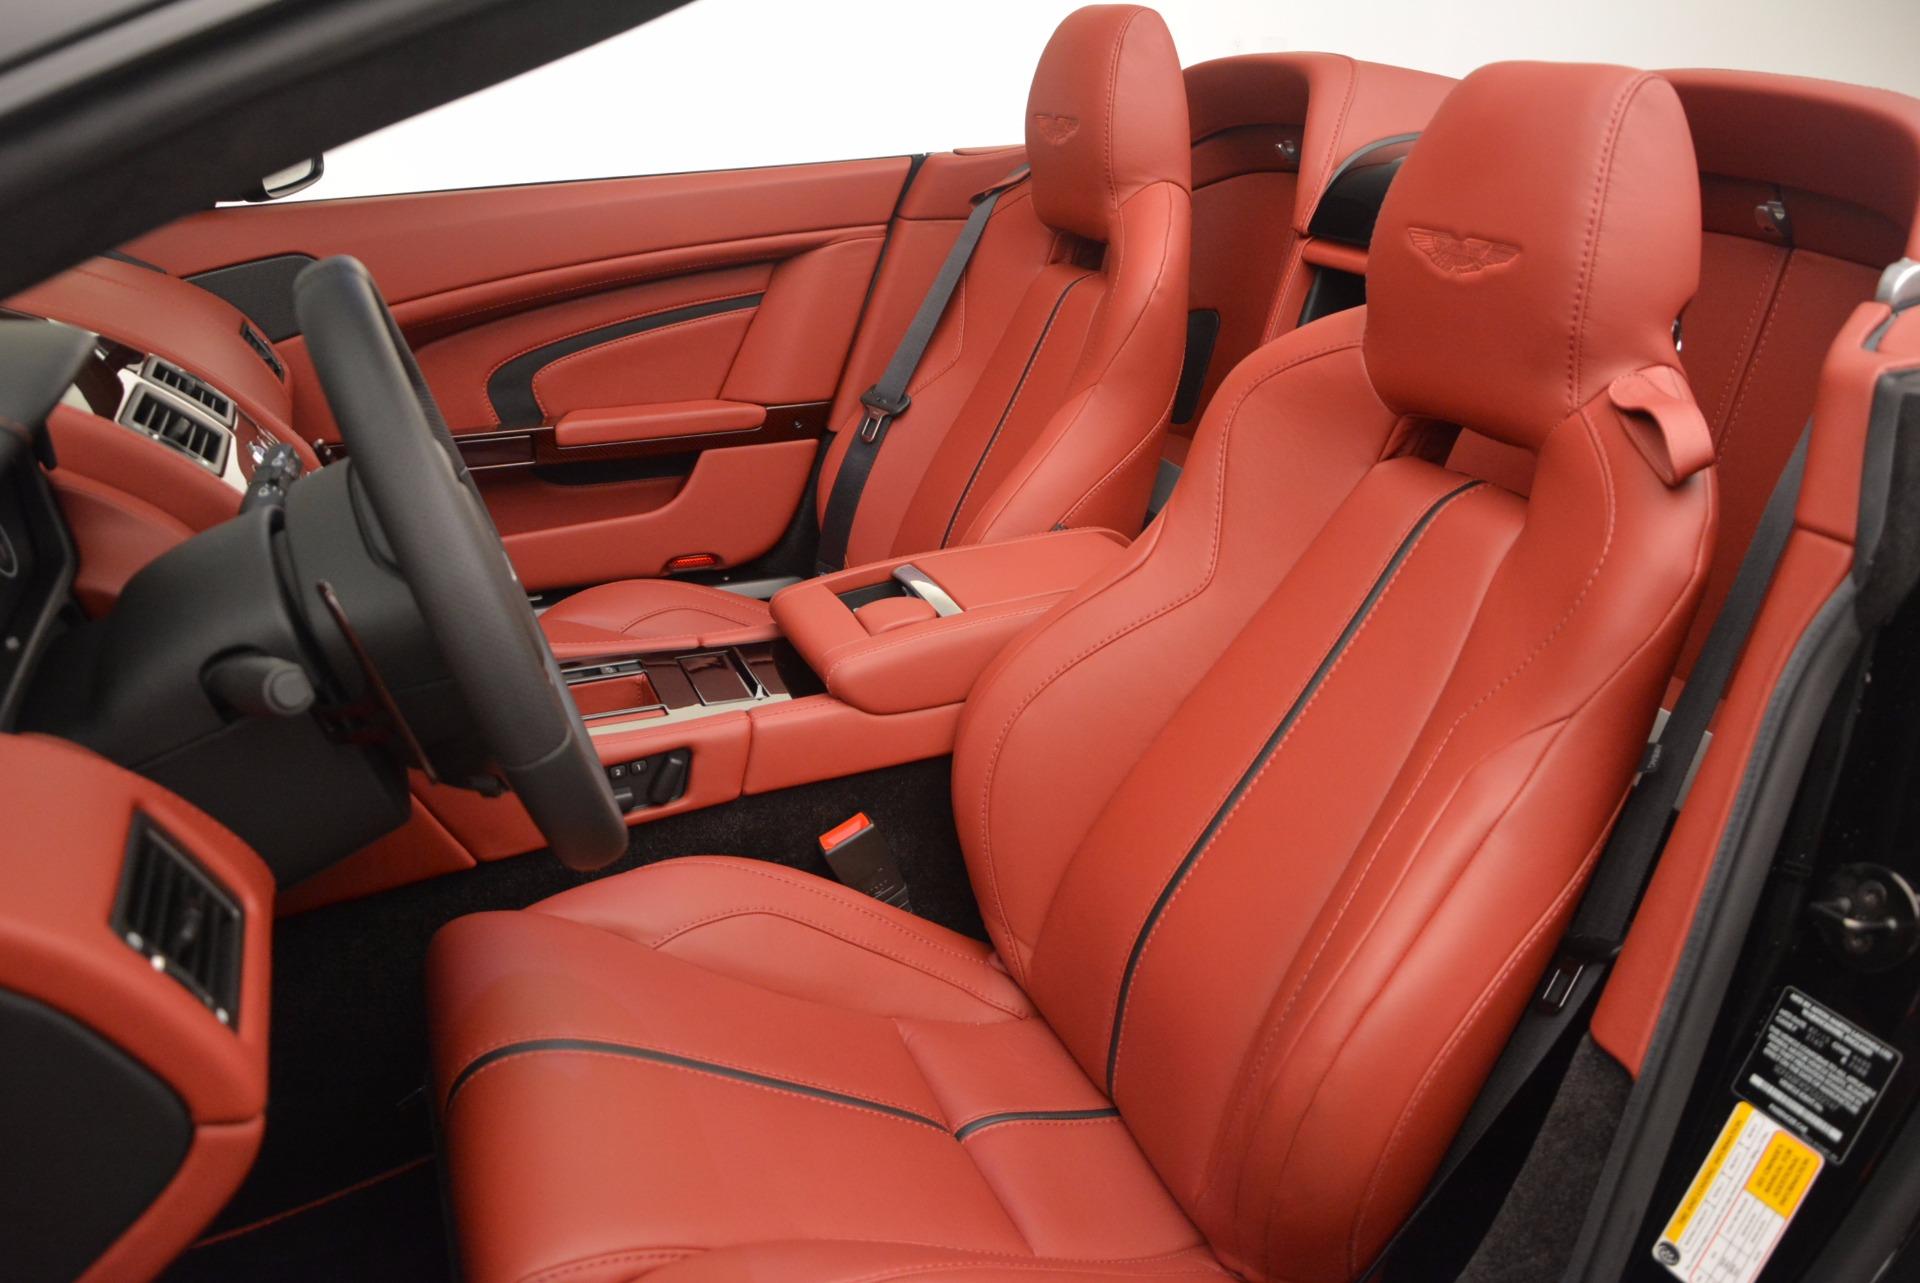 Used 2015 Aston Martin V12 Vantage S Roadster For Sale In Greenwich, CT. Alfa Romeo of Greenwich, 7227 1335_p22